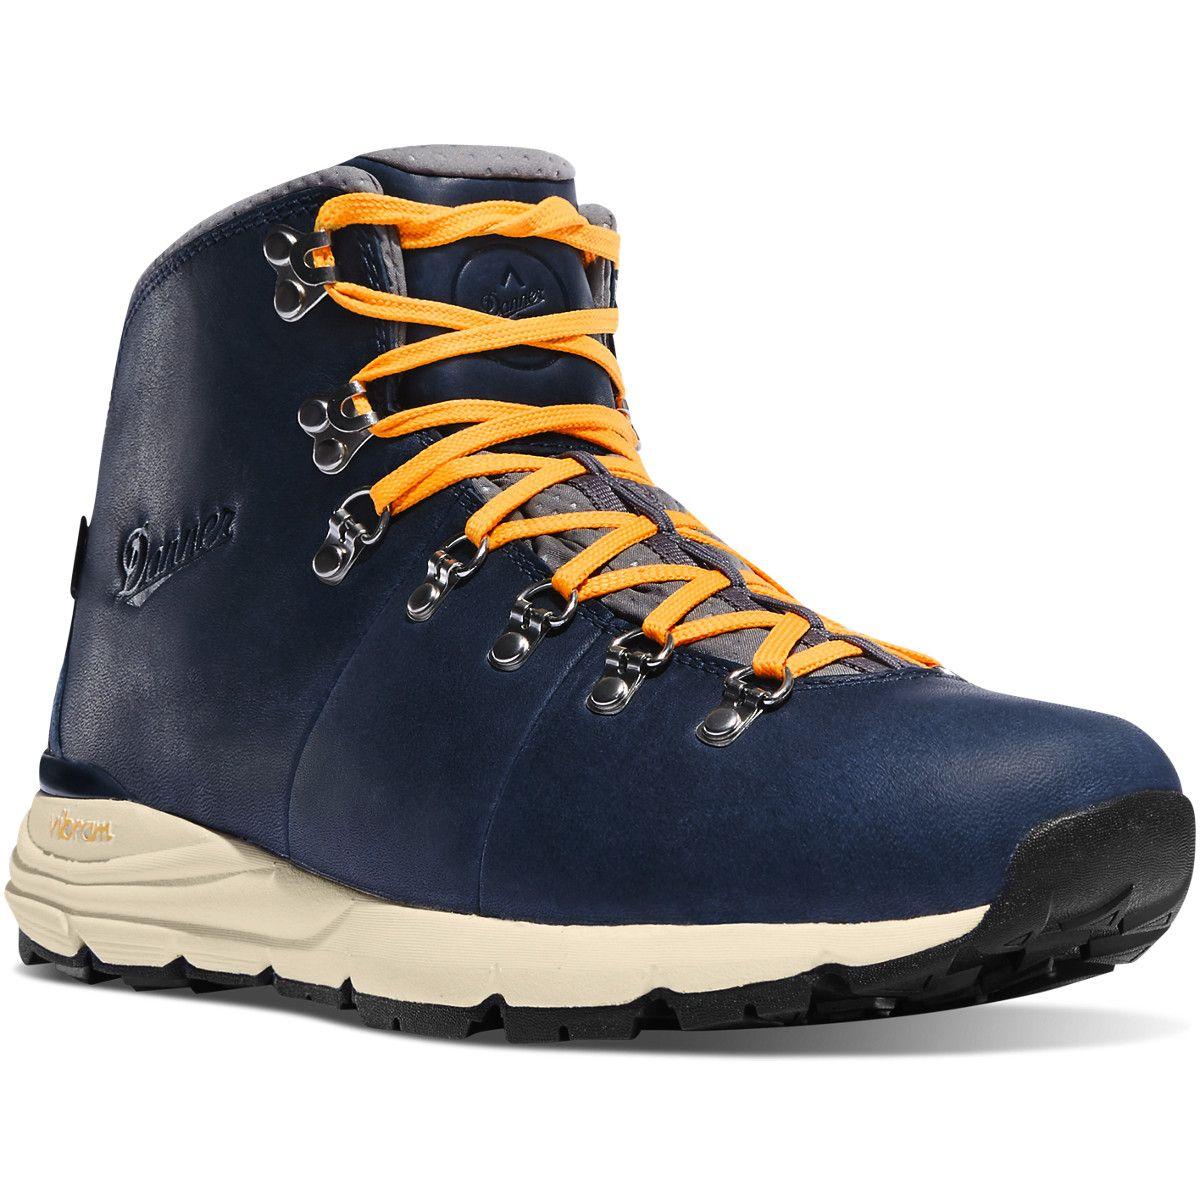 13+ Danner mens hiking boots ideas ideas